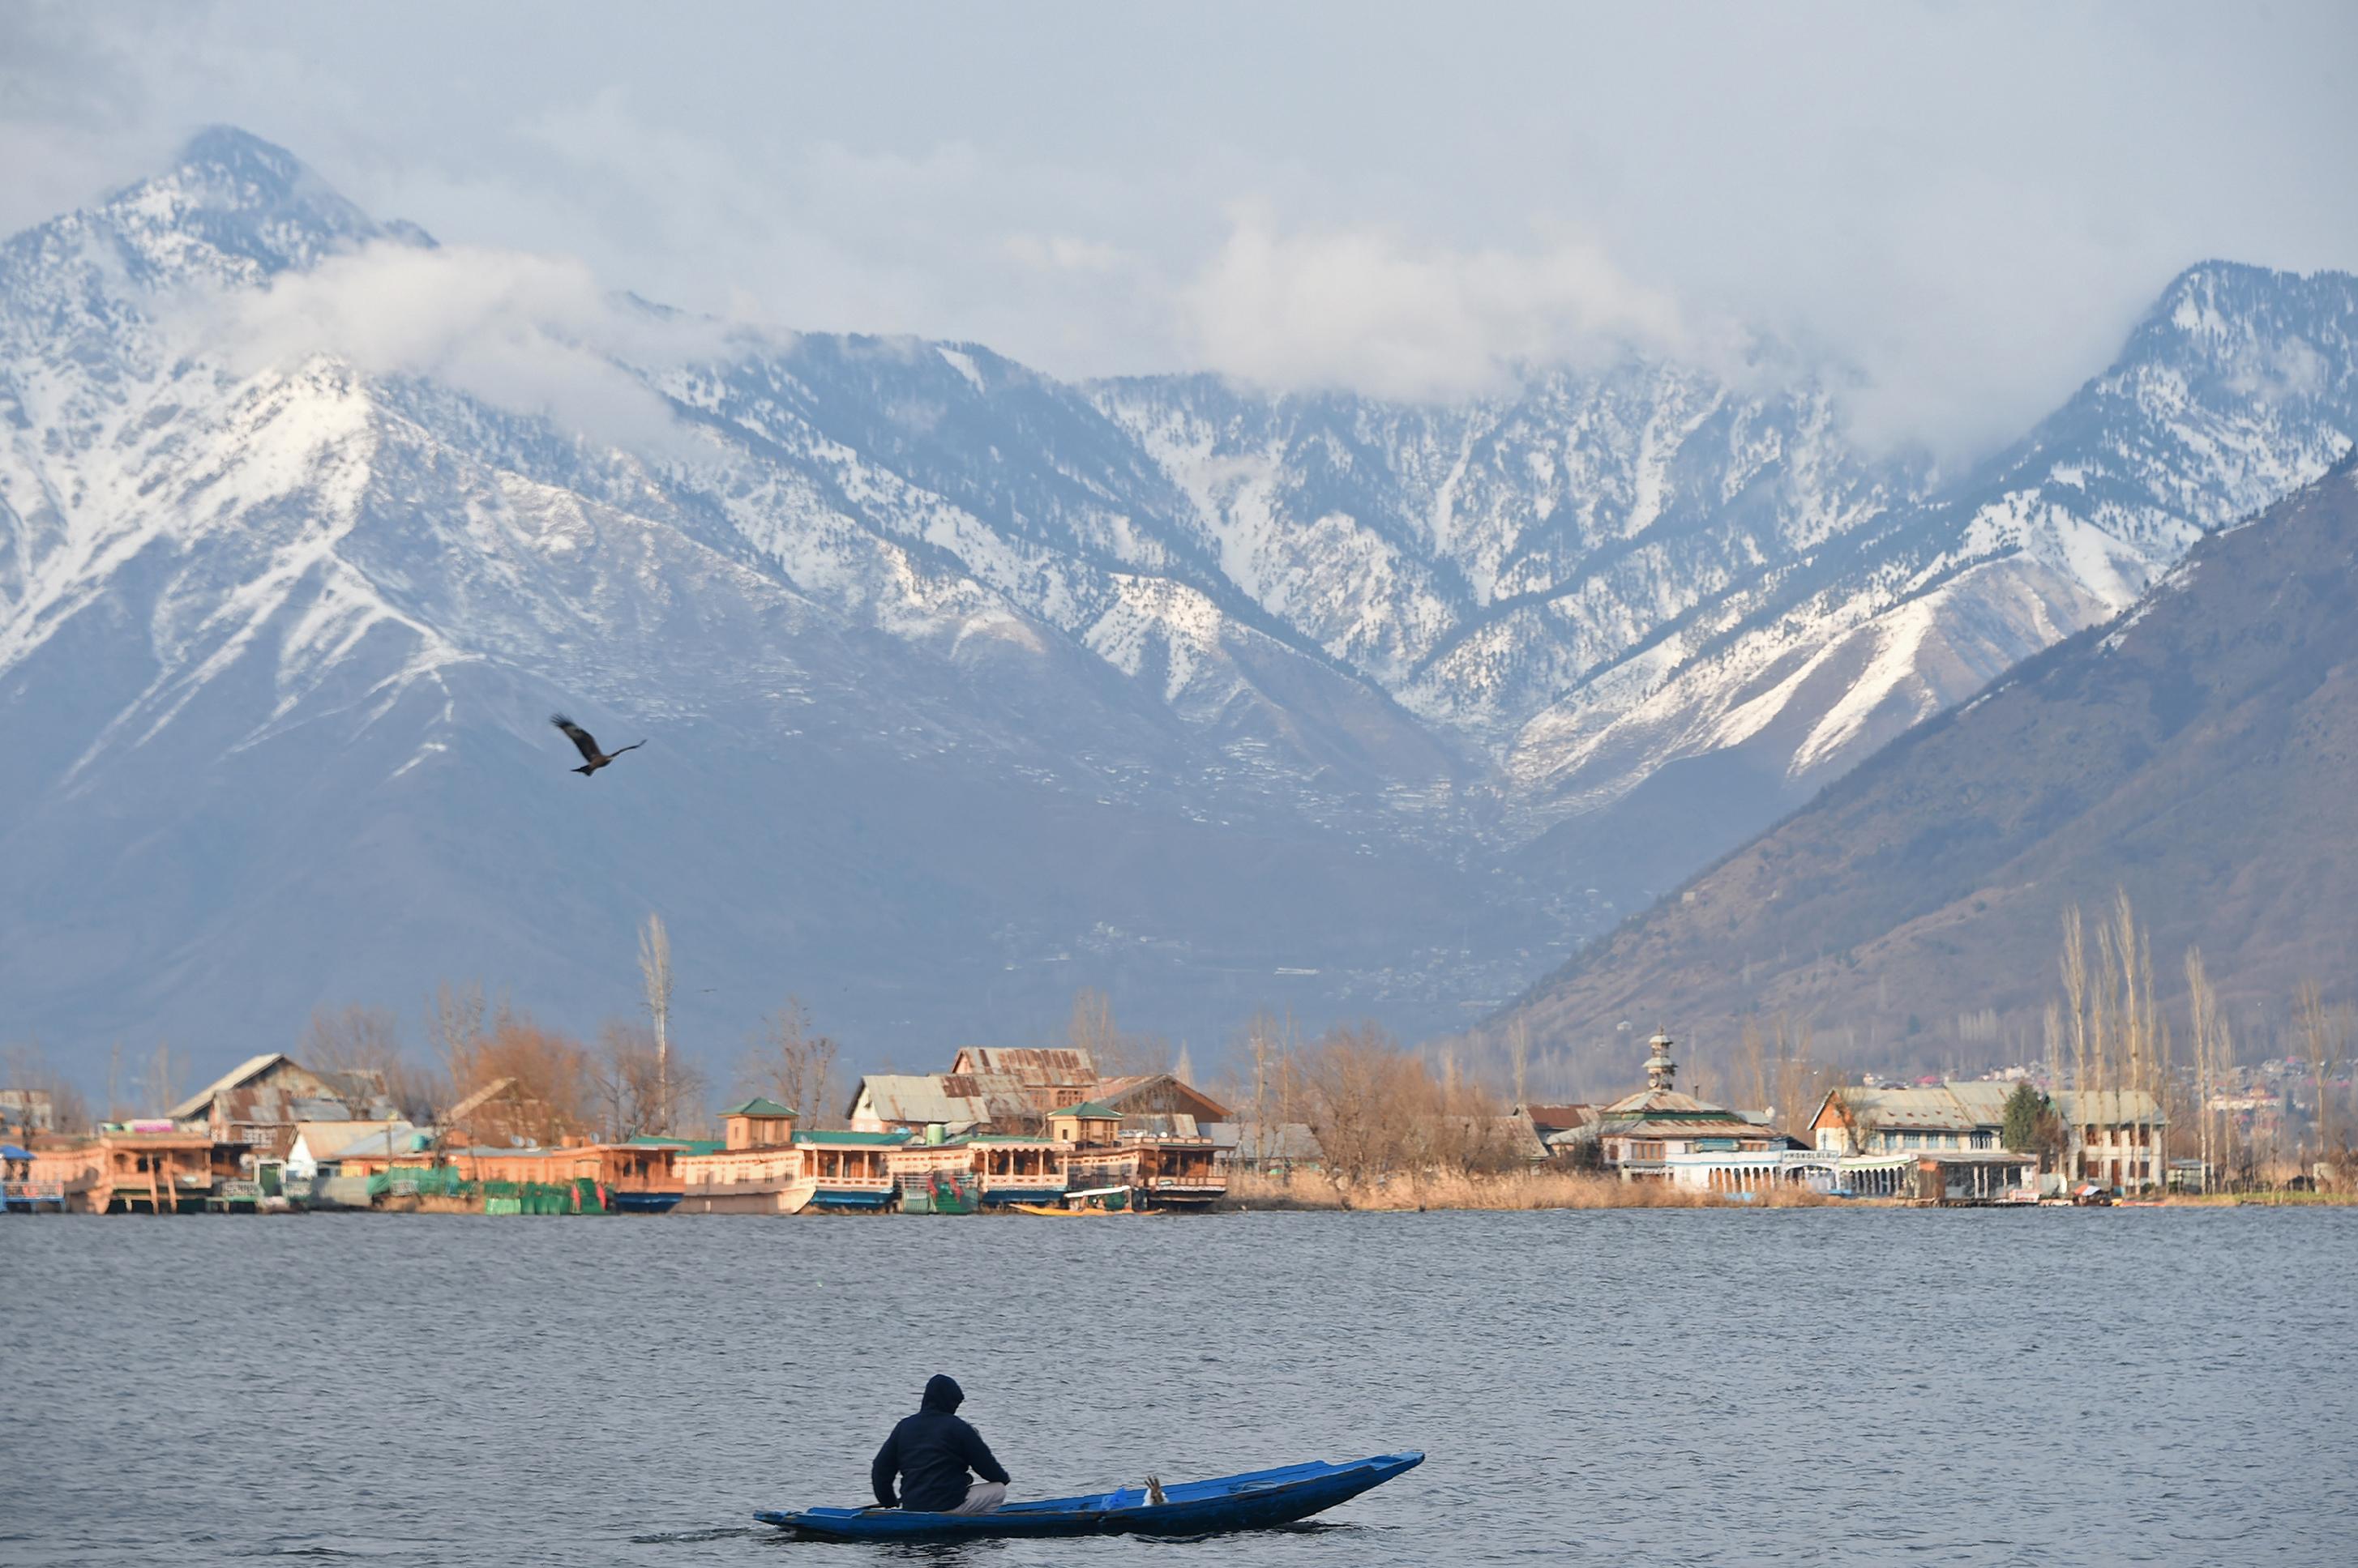 A Kashmiri man paddles his boat in Dal Lake in Srinagar on February 26, 2019.